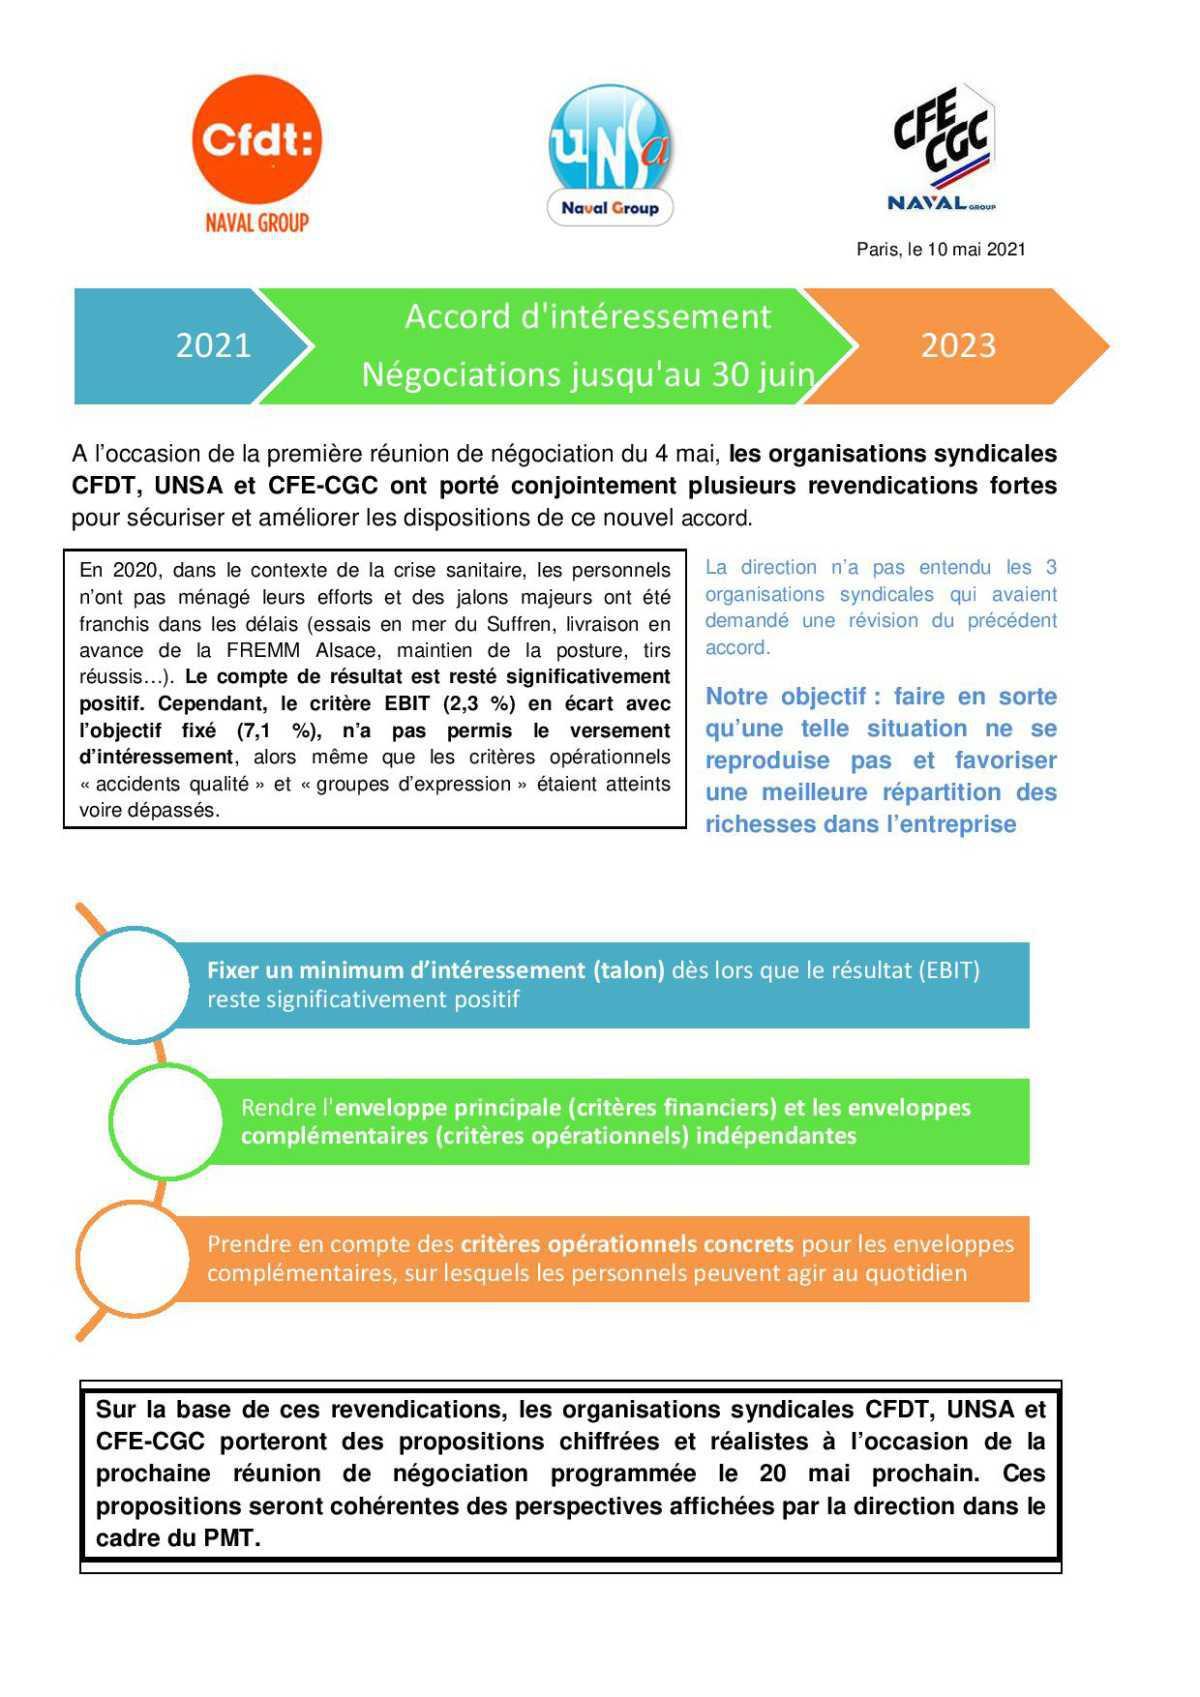 Accord d'intéressement : Négociations jusqu'au 30 juin